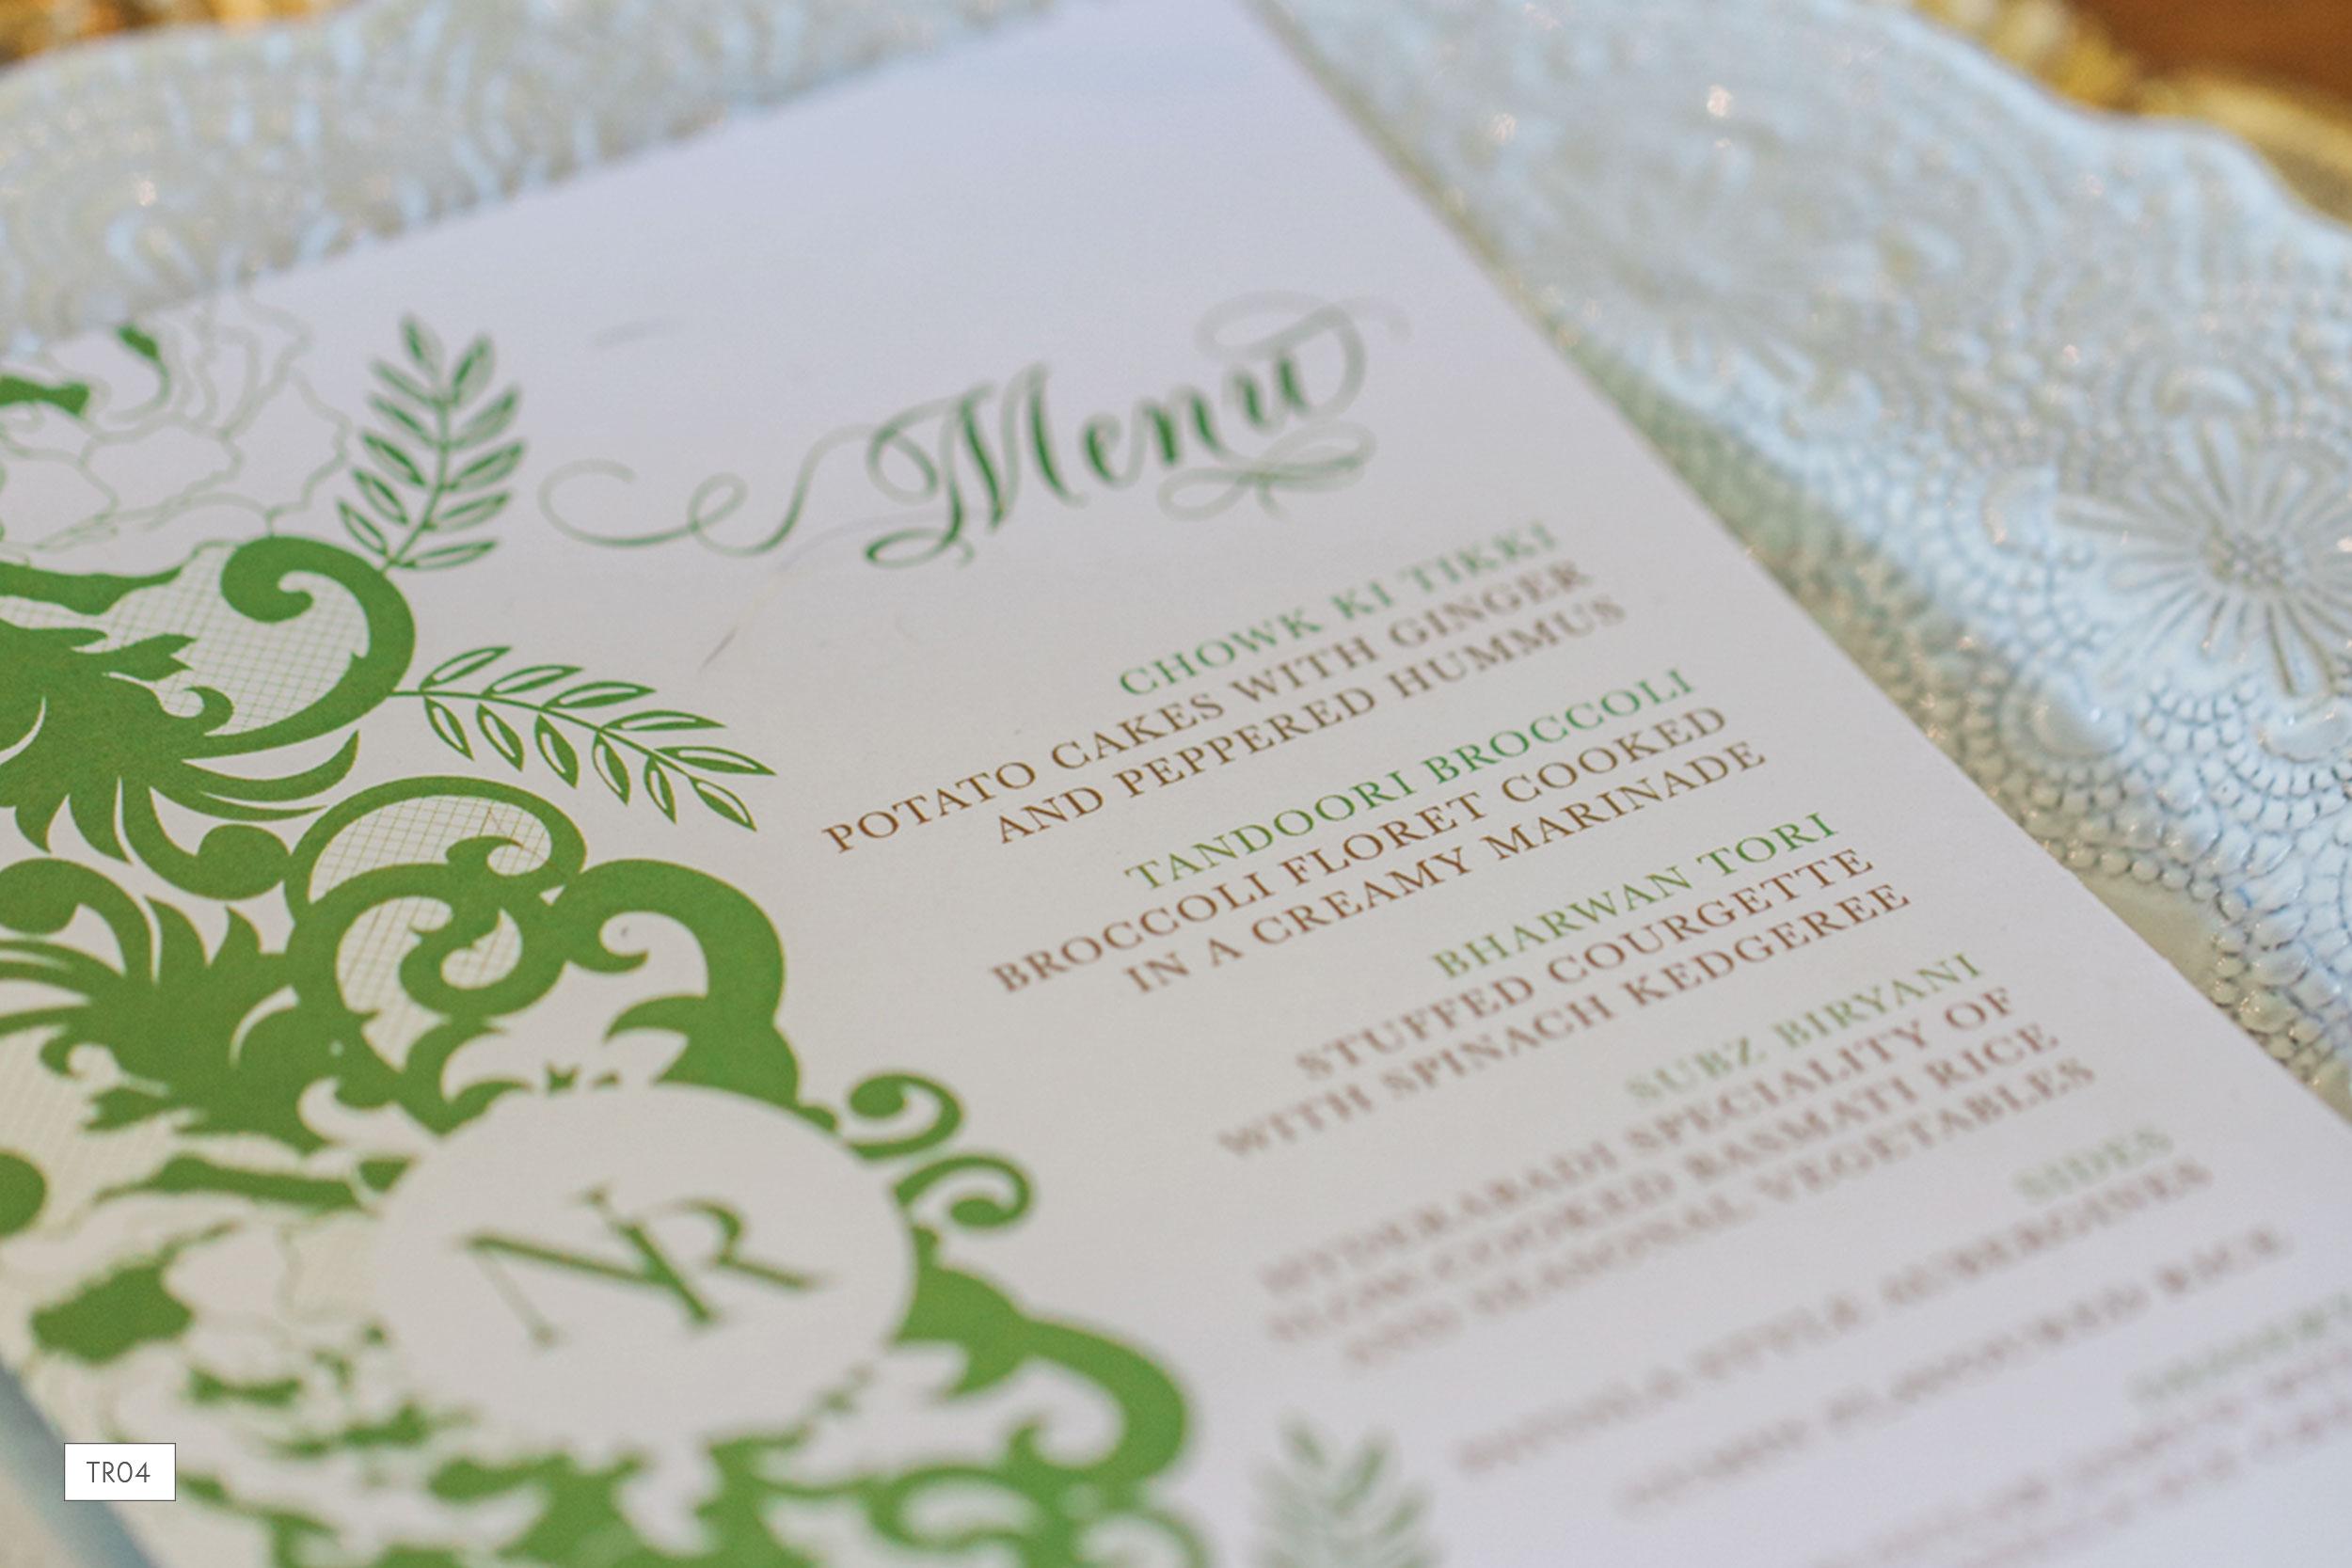 pantone-greenery-wedding-menu.jpg